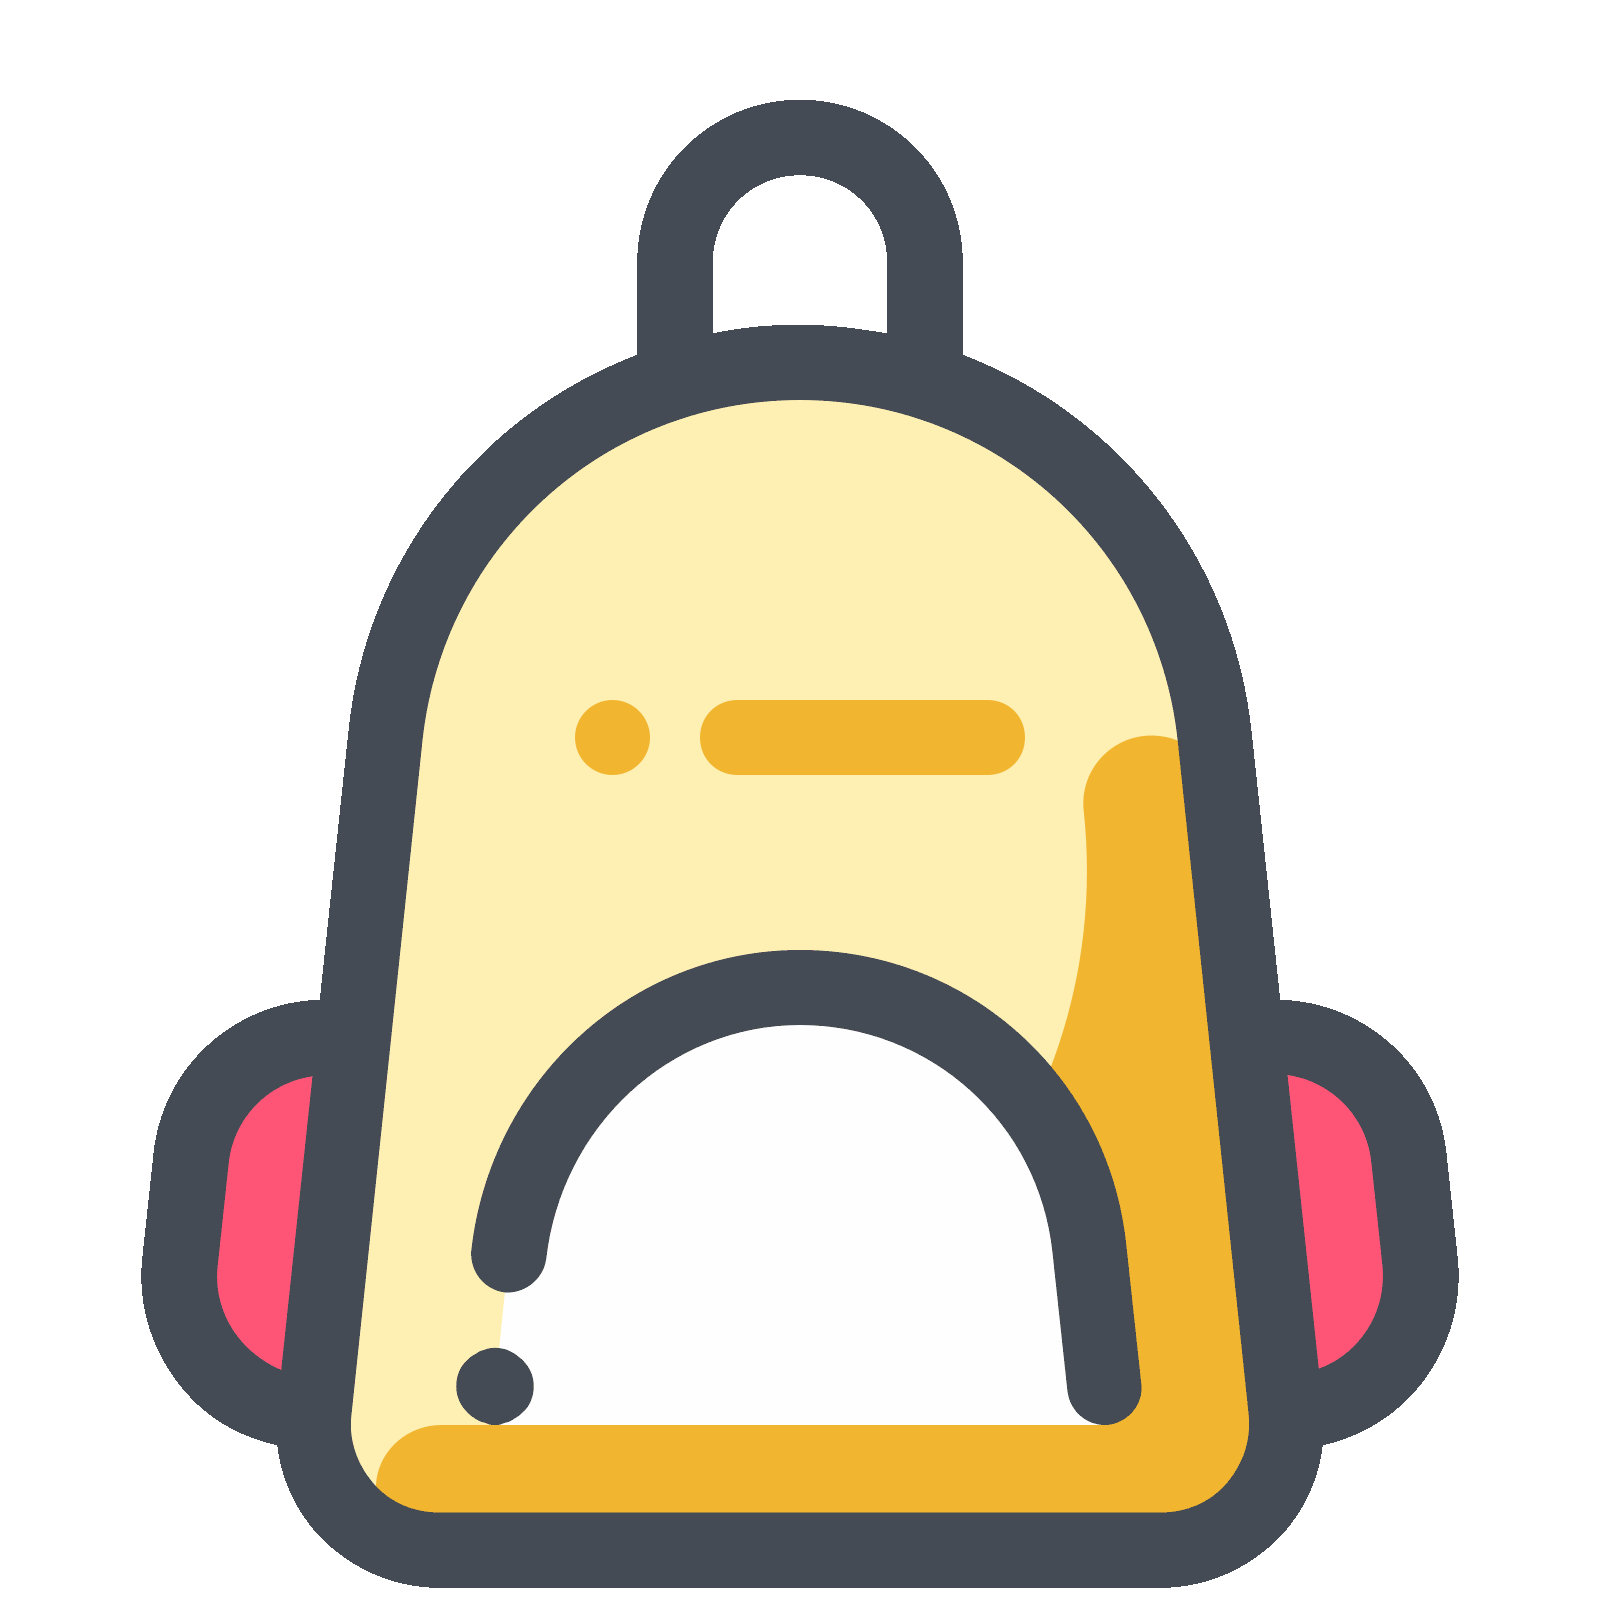 Pin On Iphone App Design